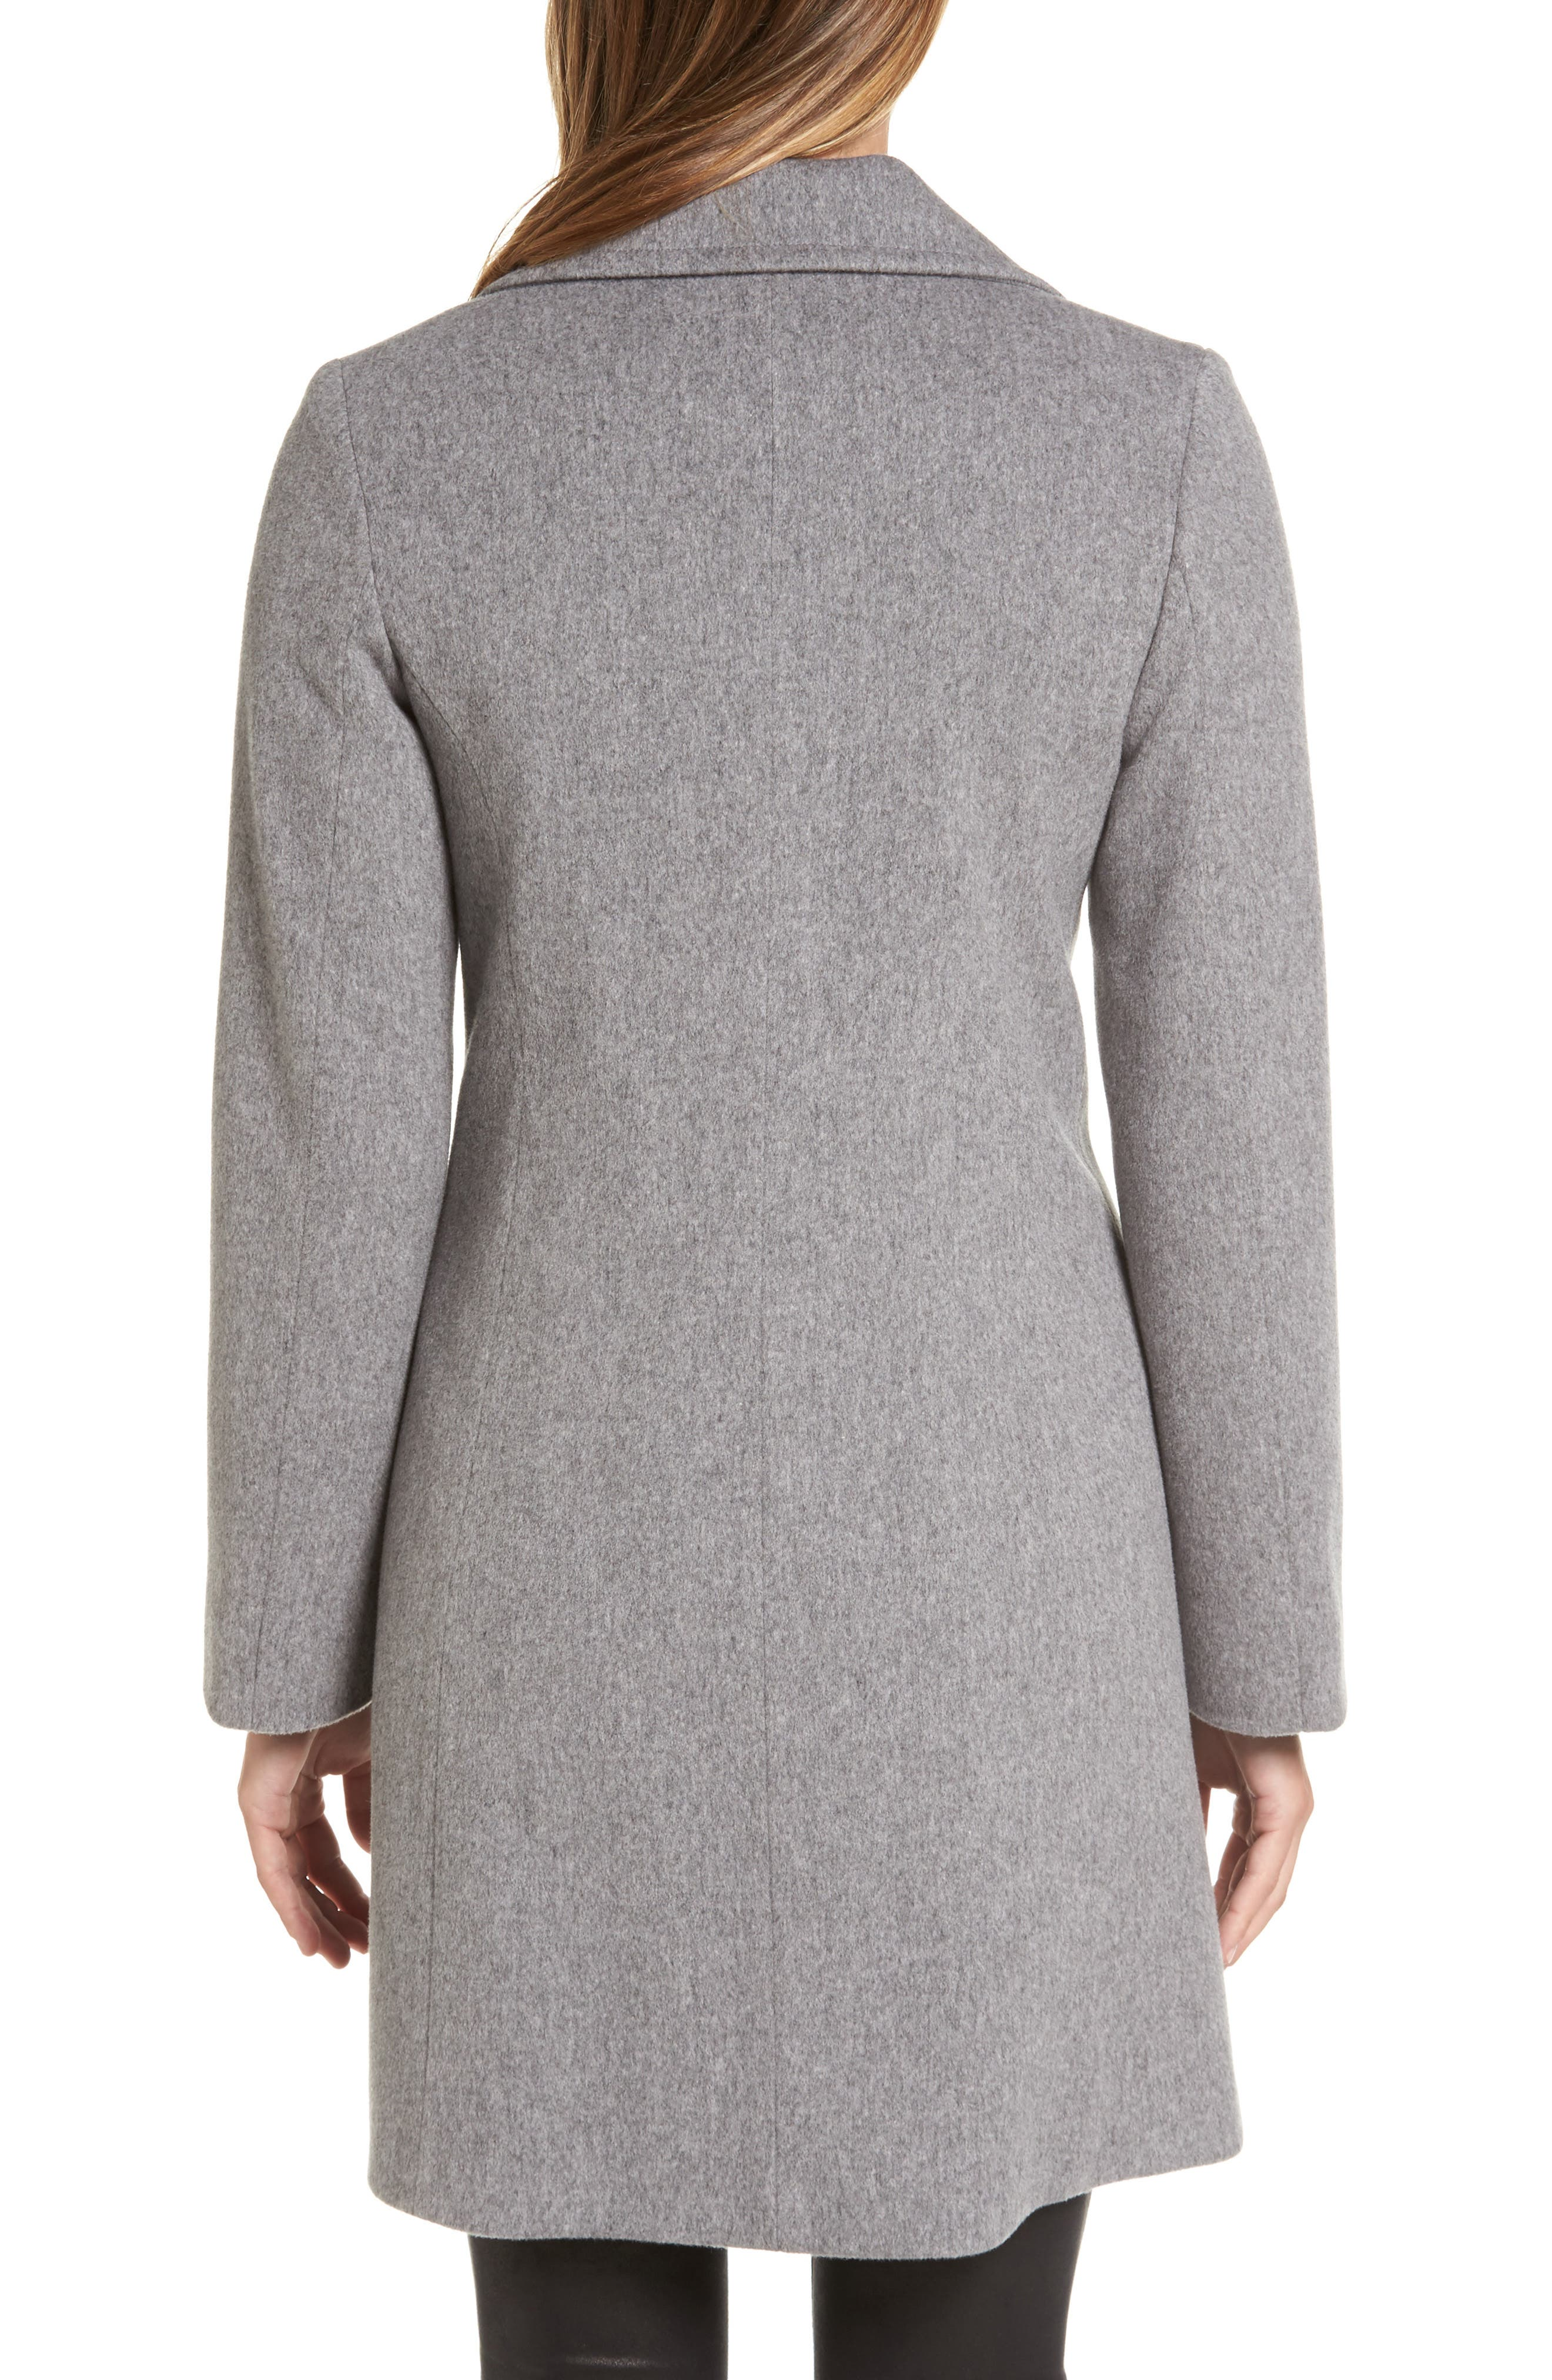 Notch Collar Wool Walking Coat,                             Alternate thumbnail 2, color,                             080